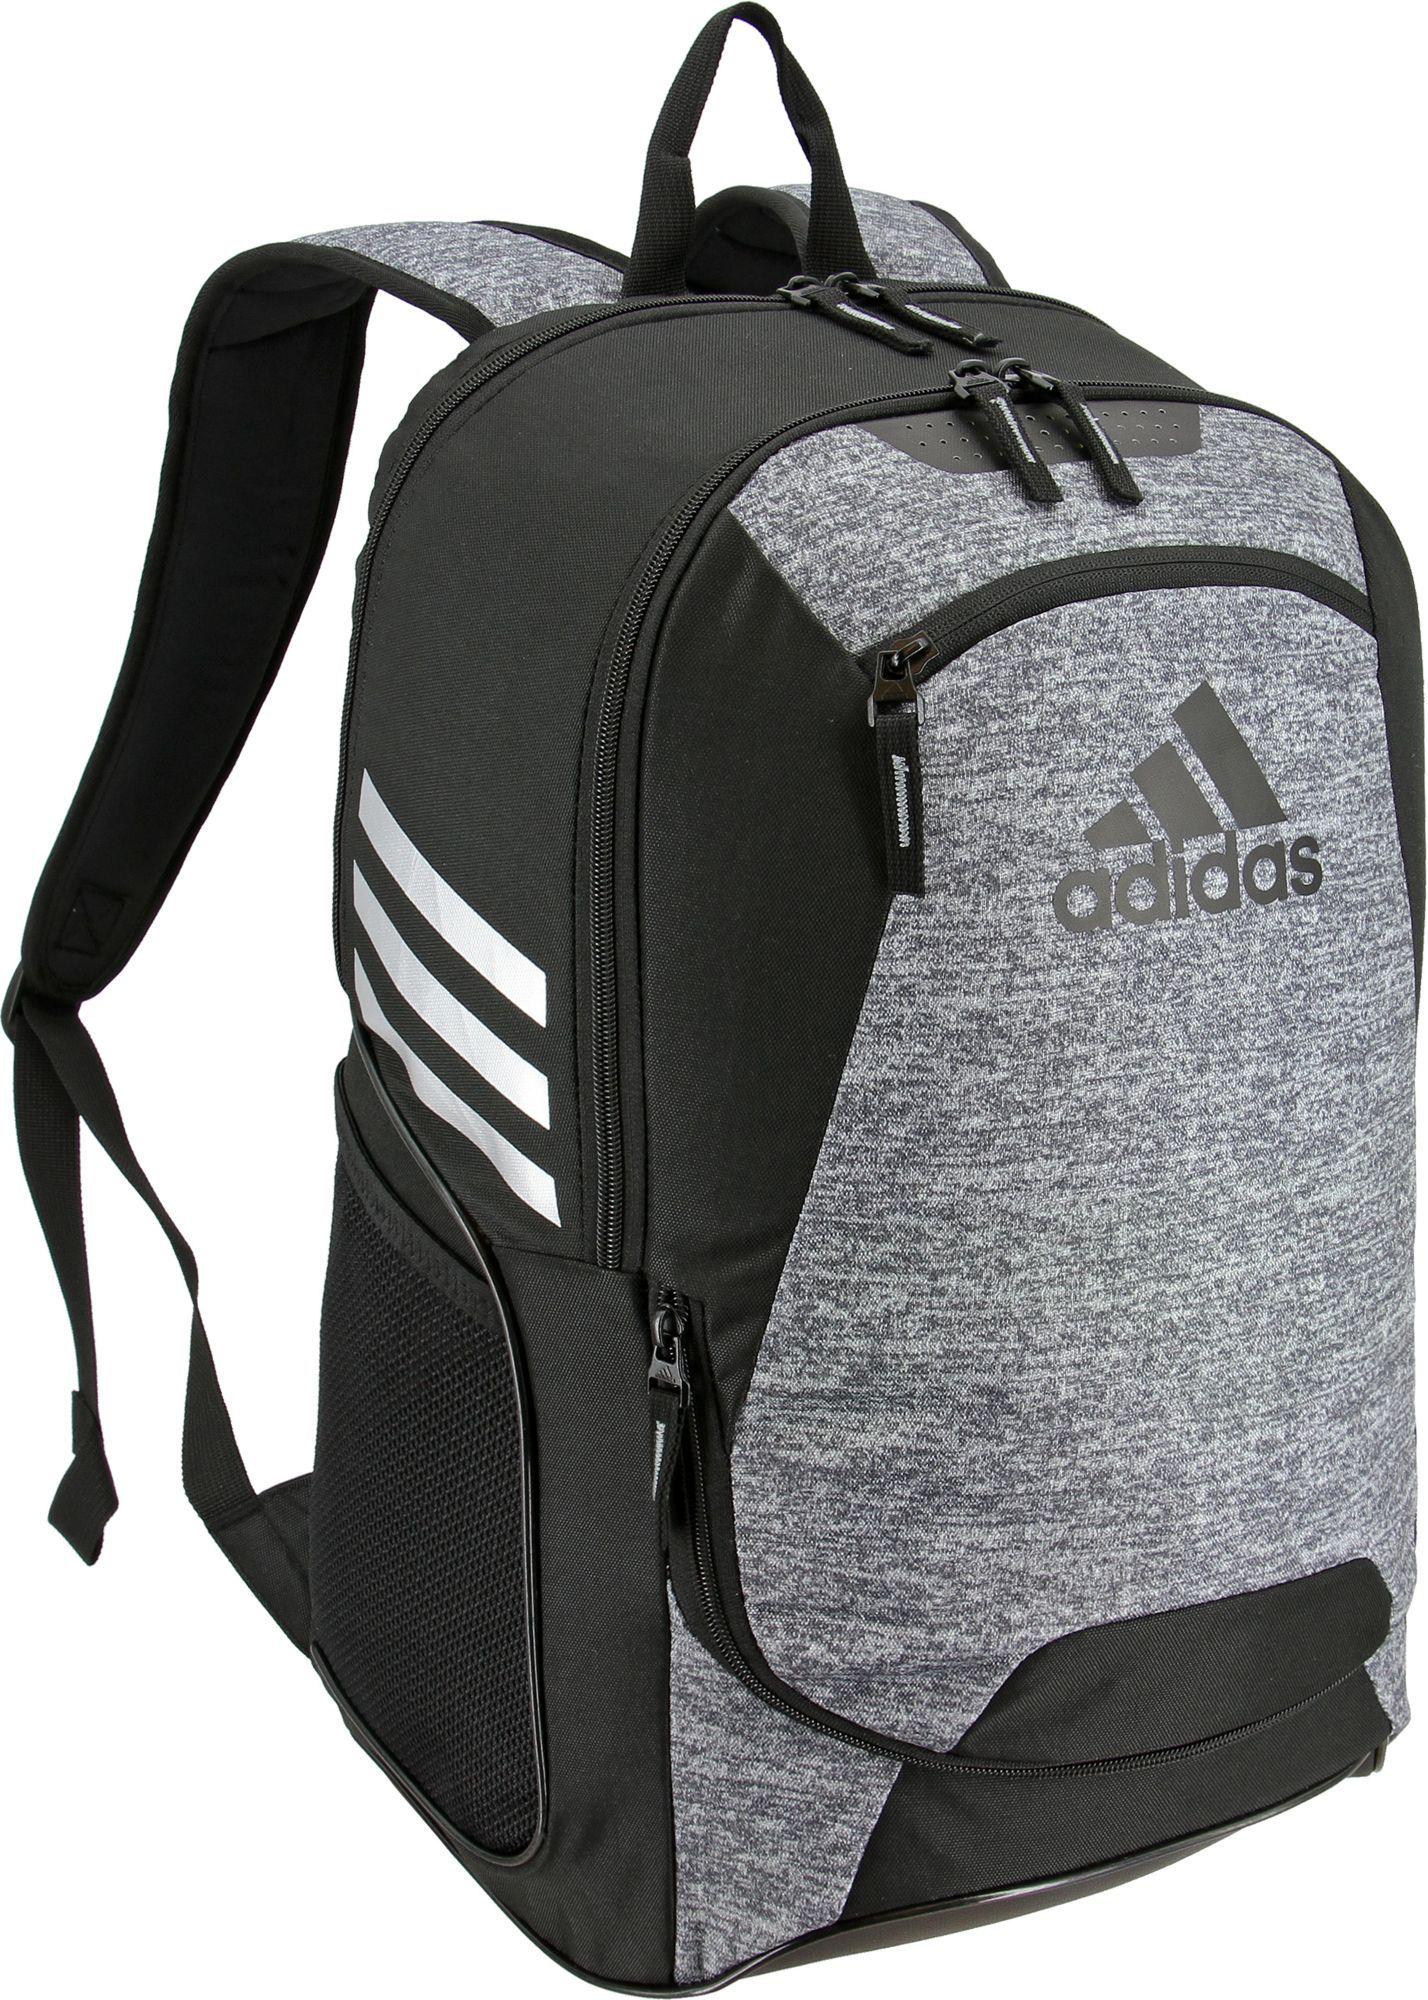 06a23ecd050a adidas Stadium II Soccer Backpack